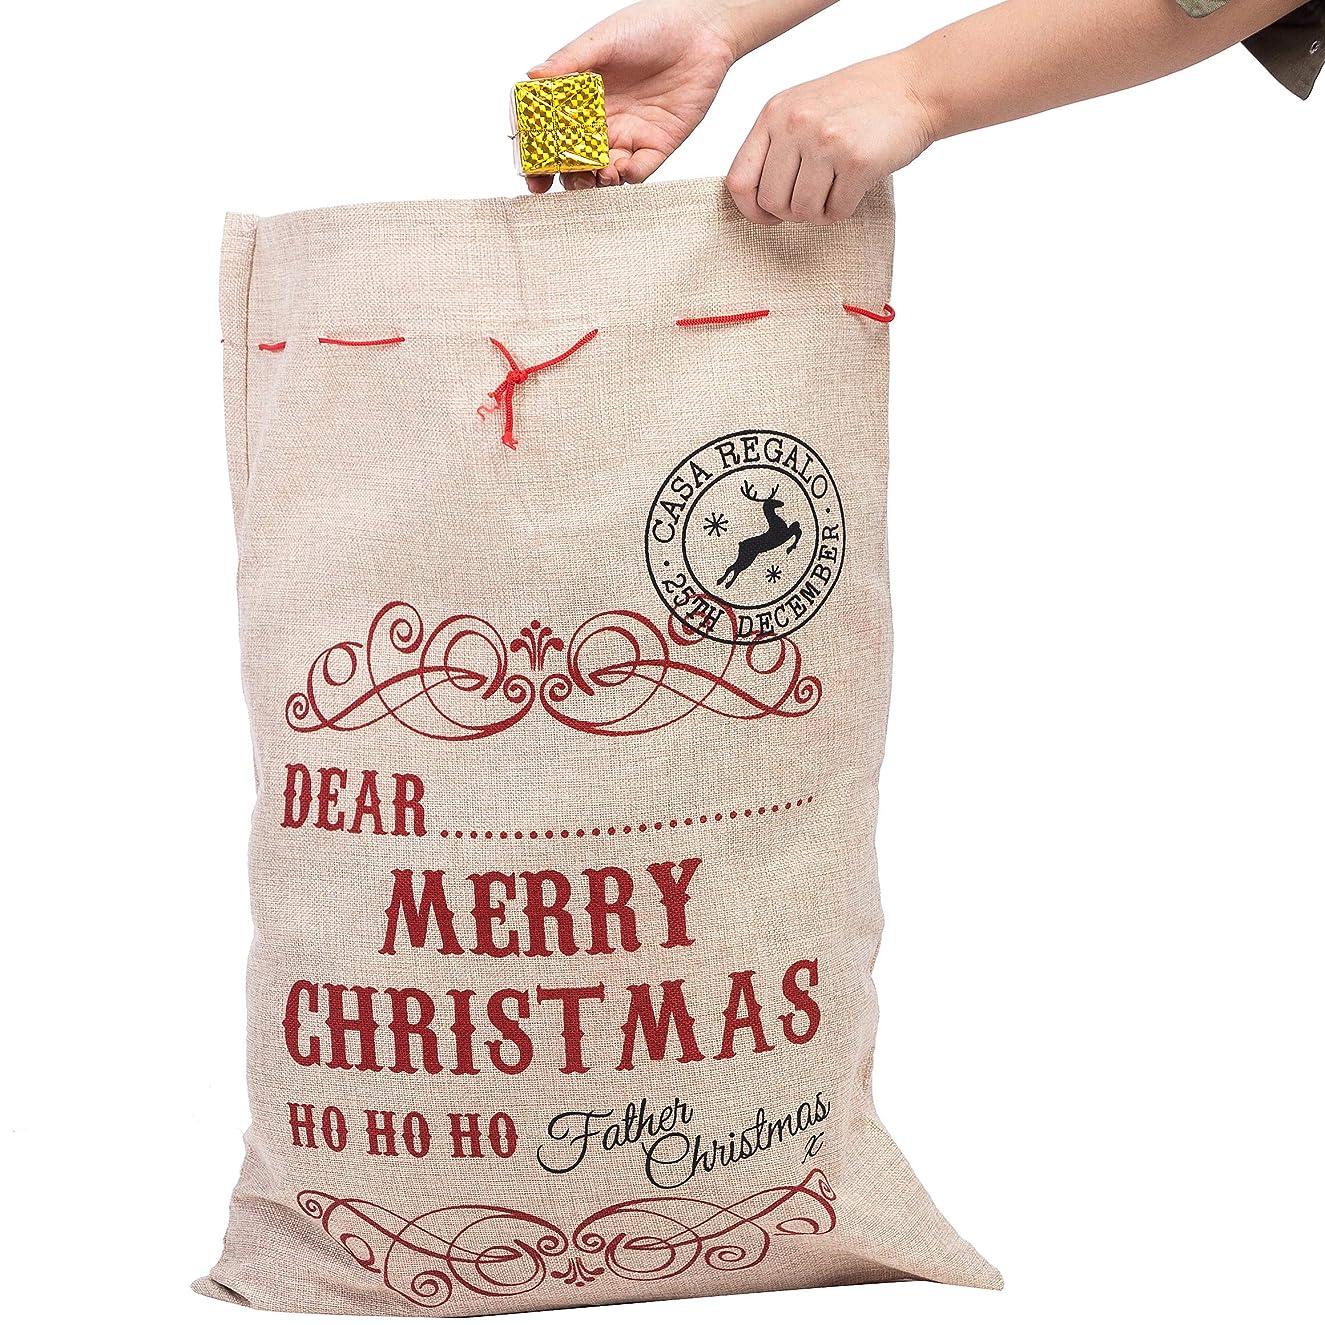 Xena 1 Piece Tan Red Extra Large Cotton Christmas Santa Gift Sack Bag W Drawstring 26.5 x 19 Inch Personalize Boy Girls